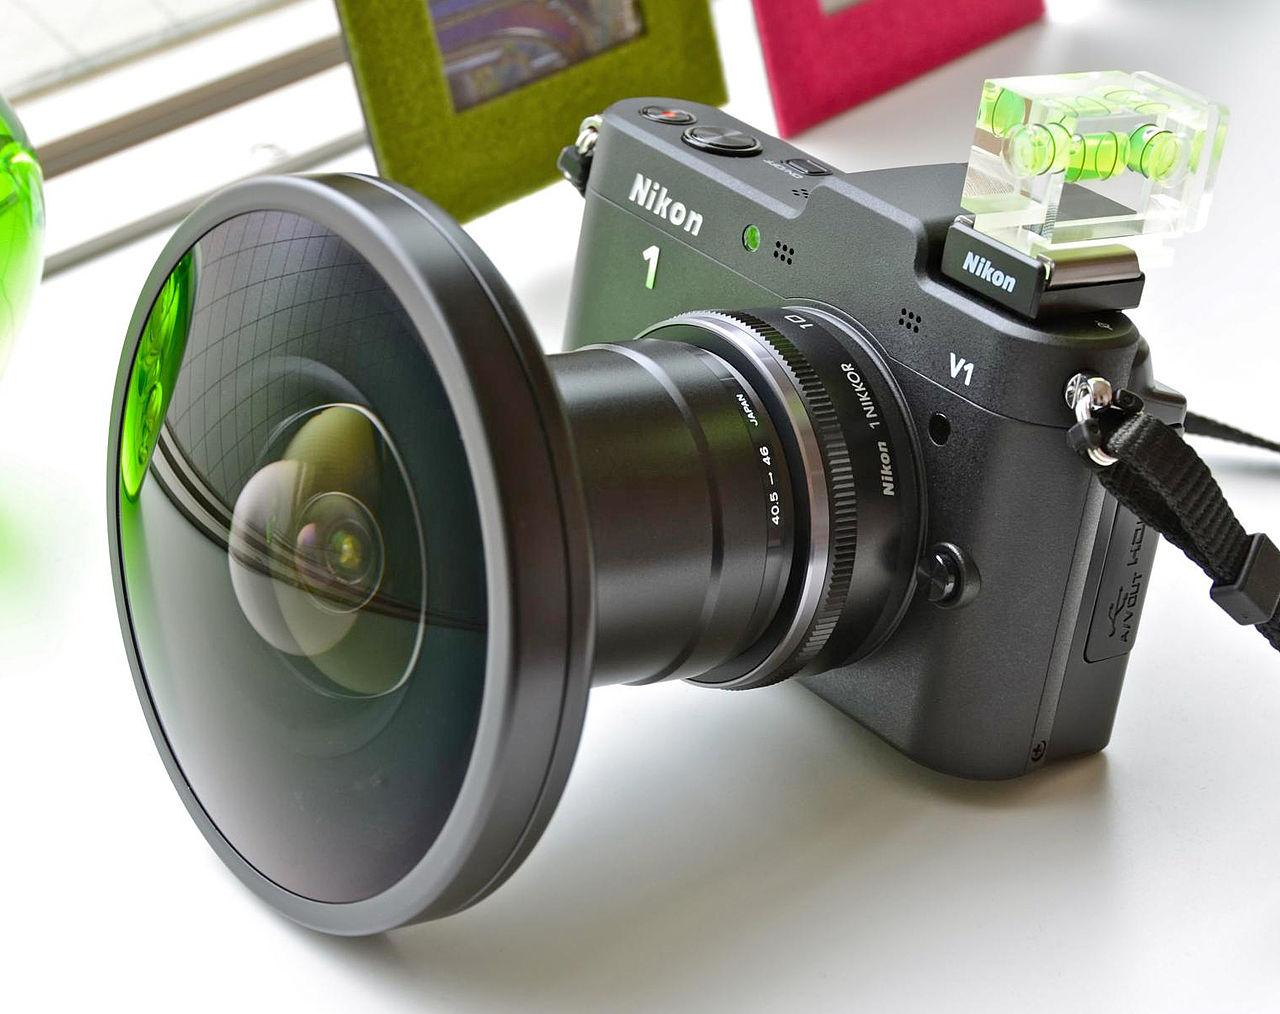 File Nikon 1 V1 Fisheye Fc E9 01 Jpg Wikimedia Commons